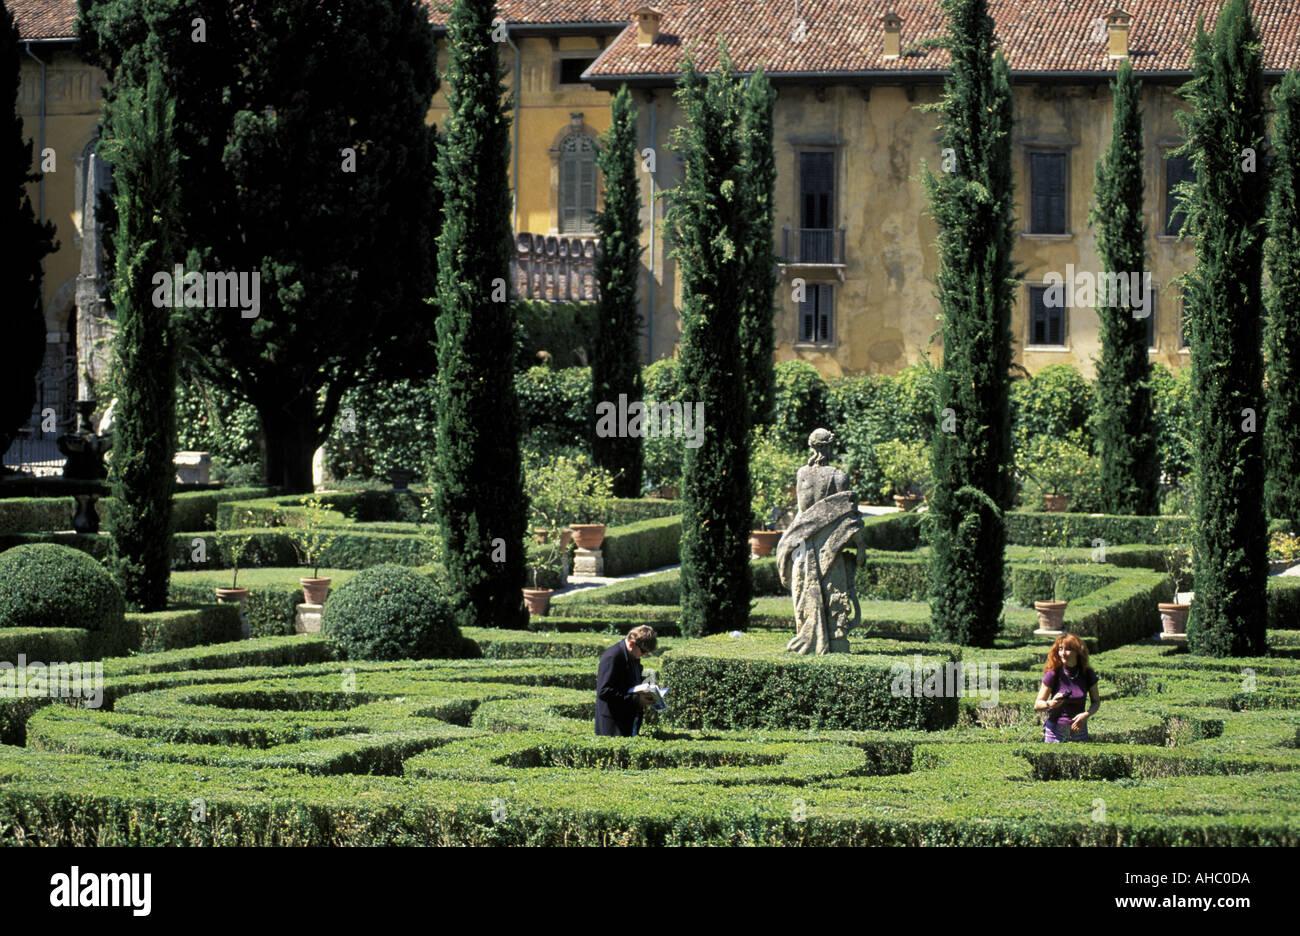 Giardino giusti verona veneto italia foto immagine stock